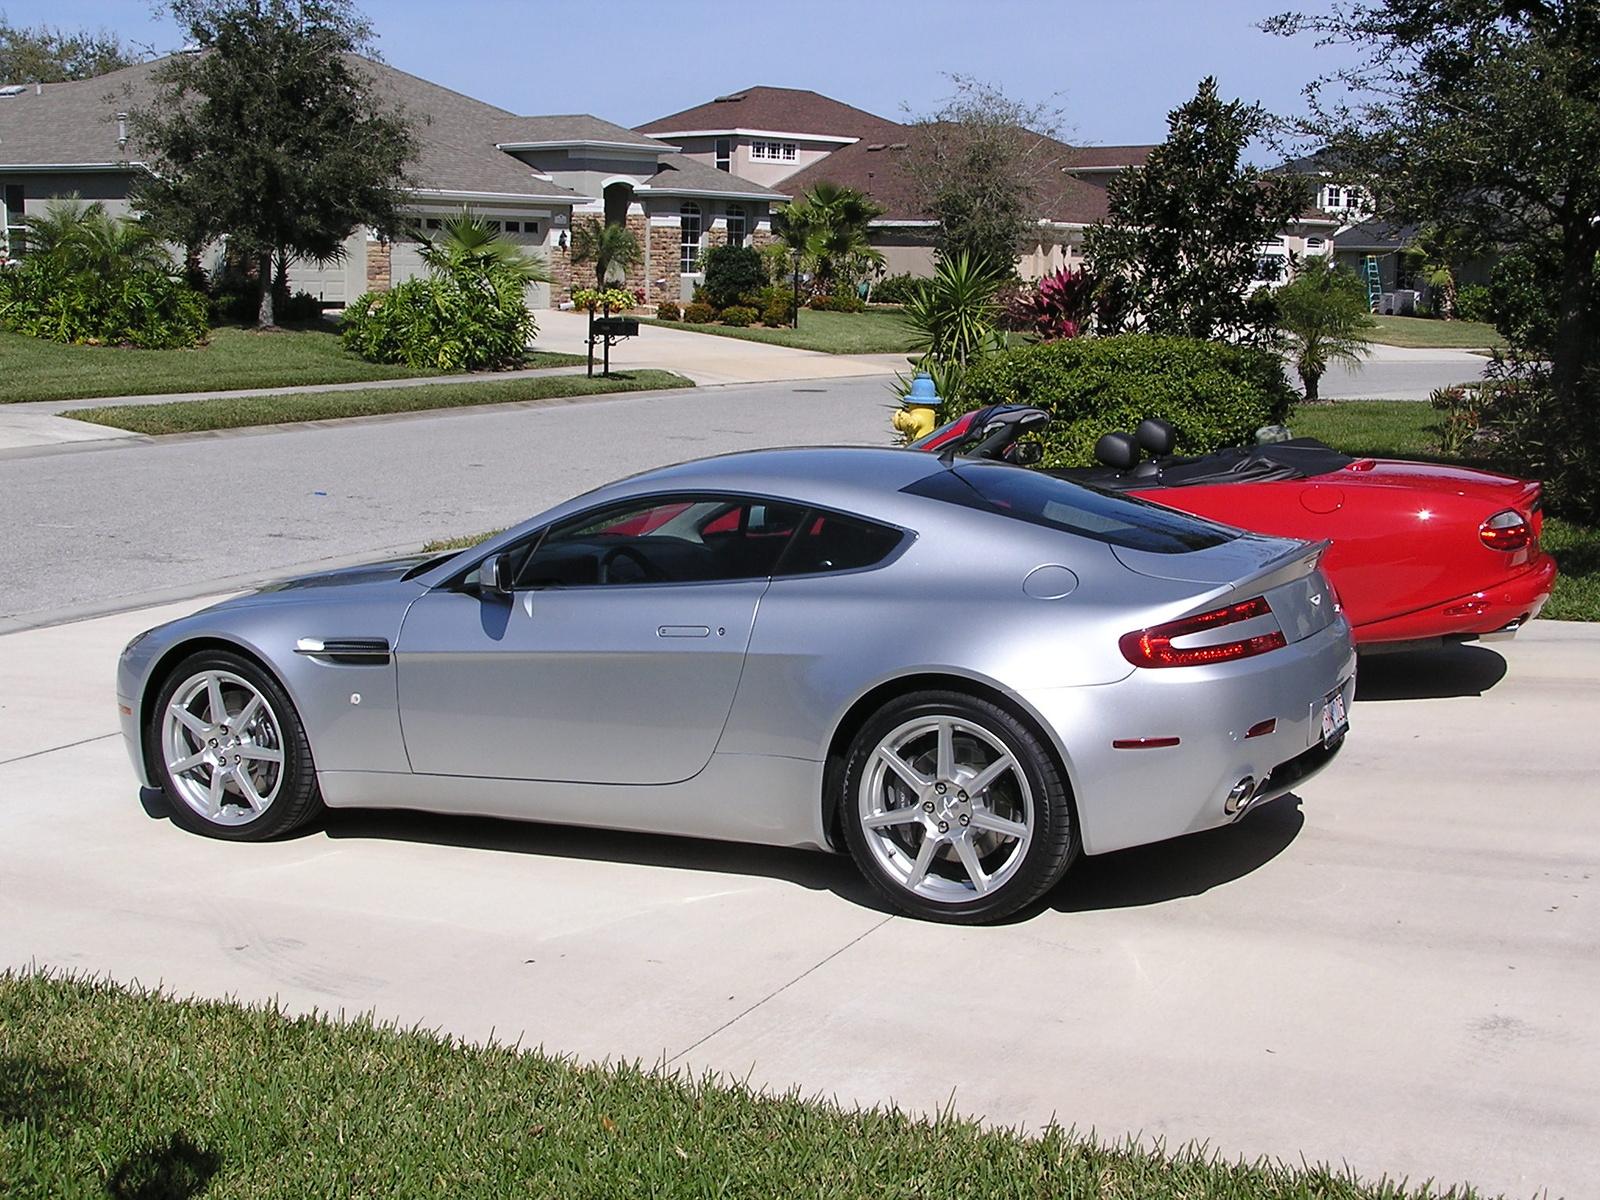 Topworldauto Photos Of Aston Martin V8 Vantage Photo Galleries